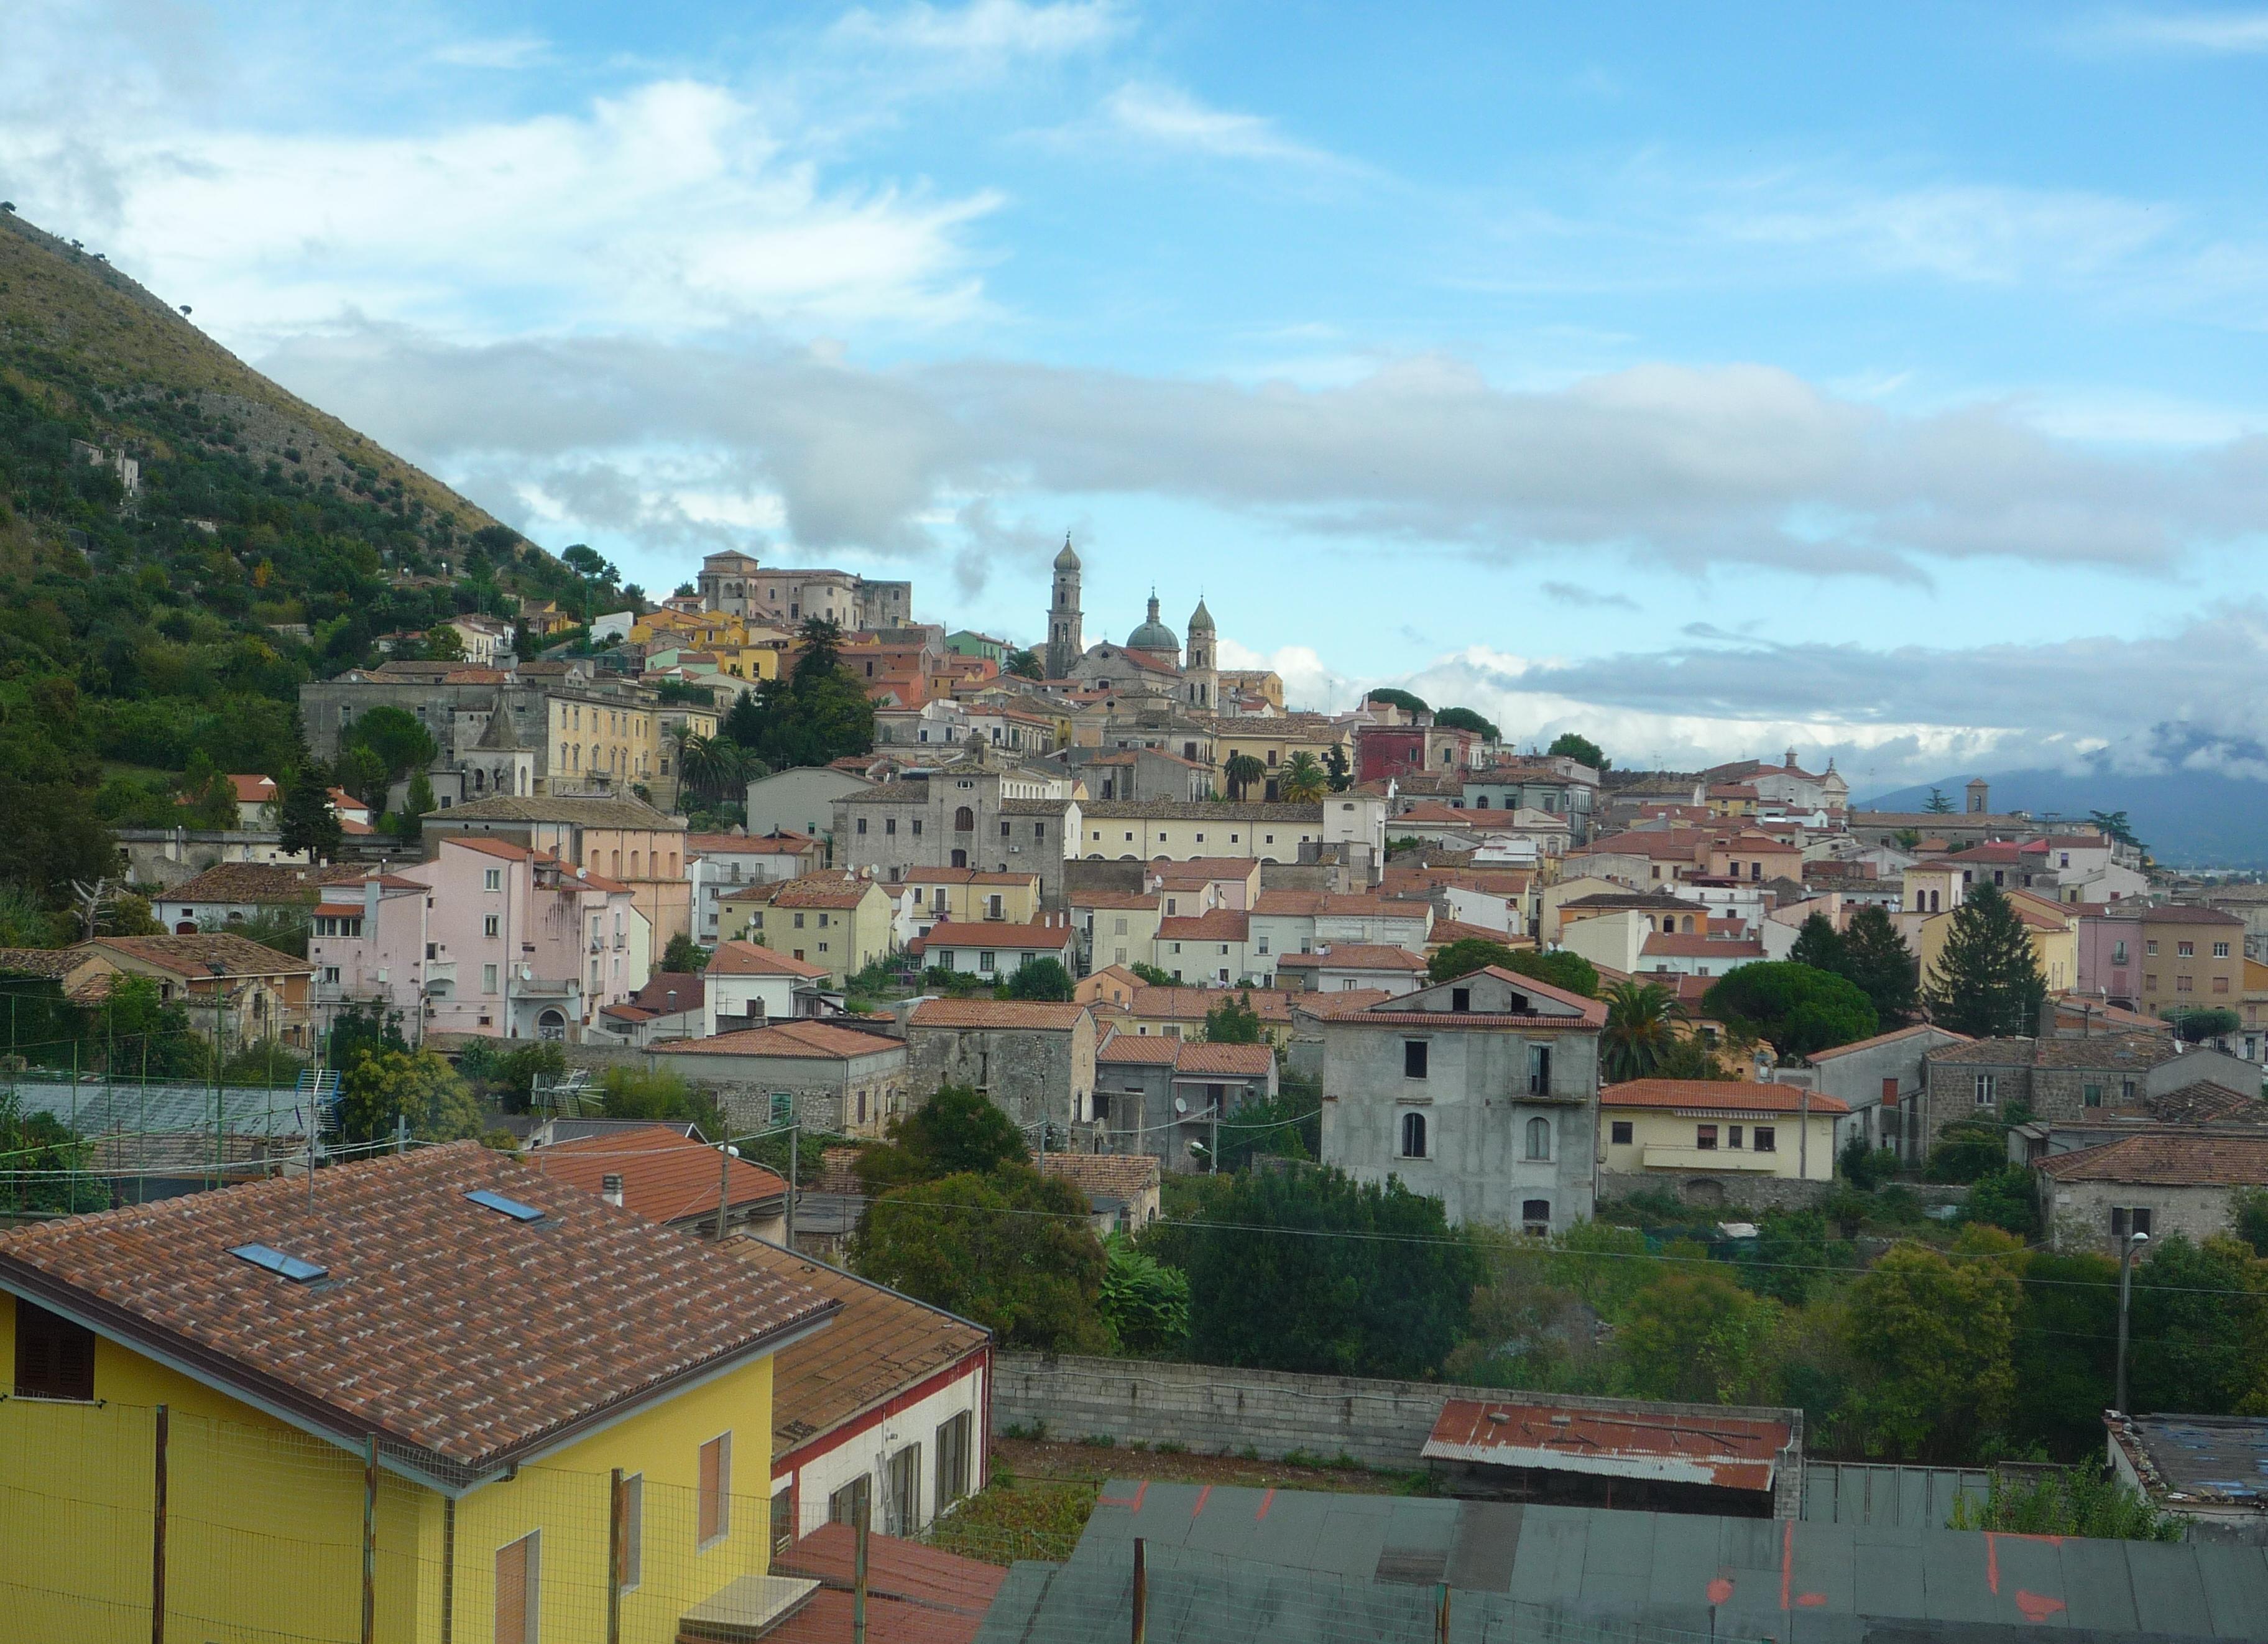 museo-nazionale-del-molise-castello-pand-secret-world